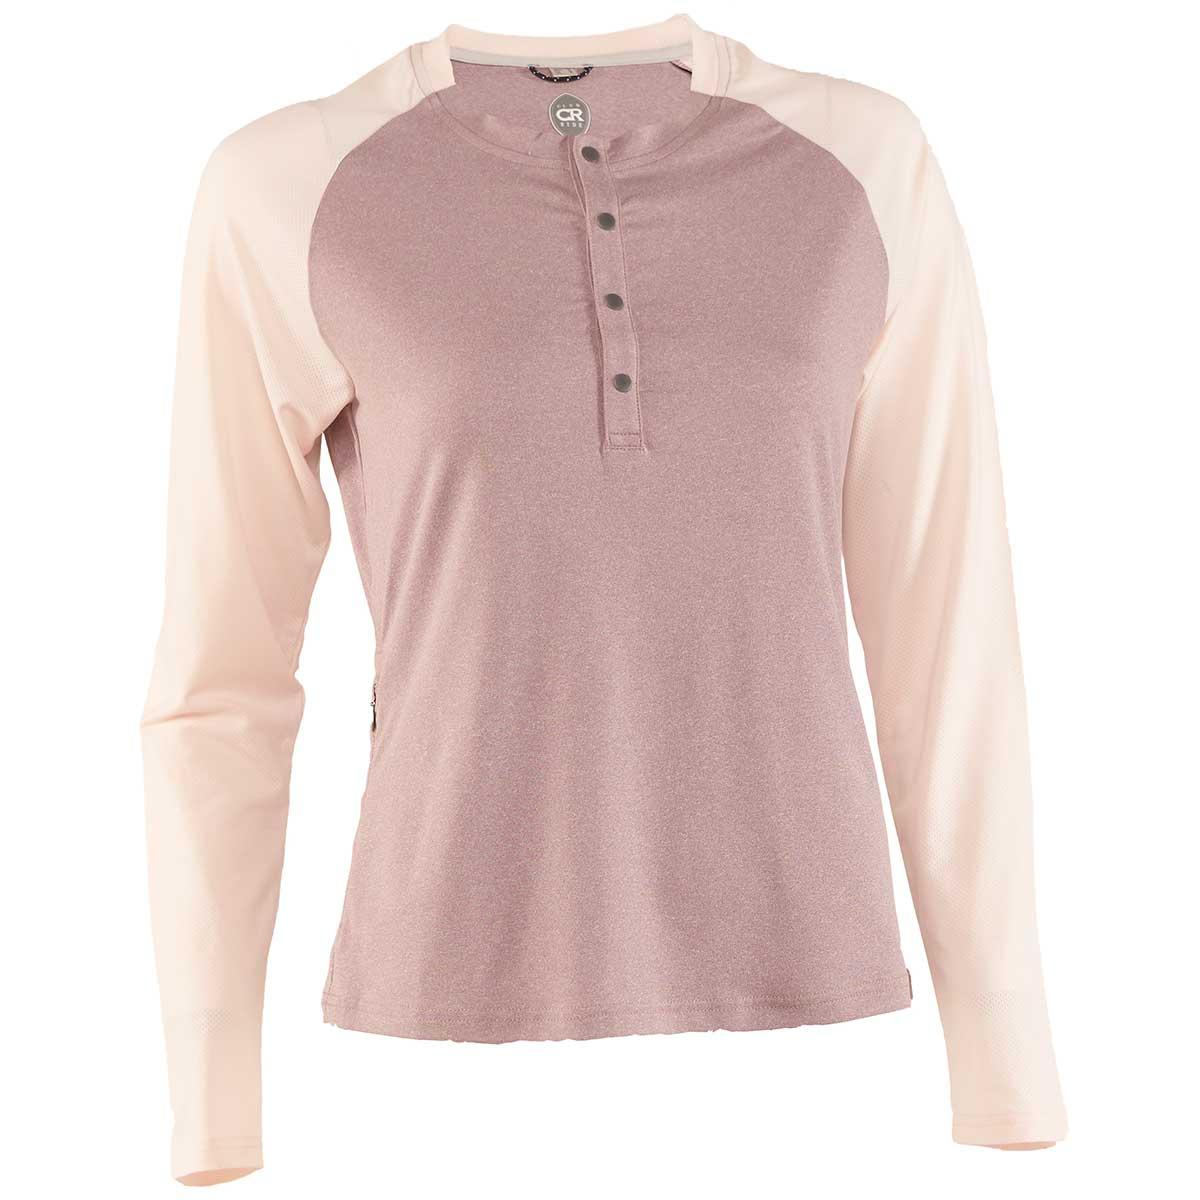 Club Ride Ida Long Sleeve Jersey - Women's